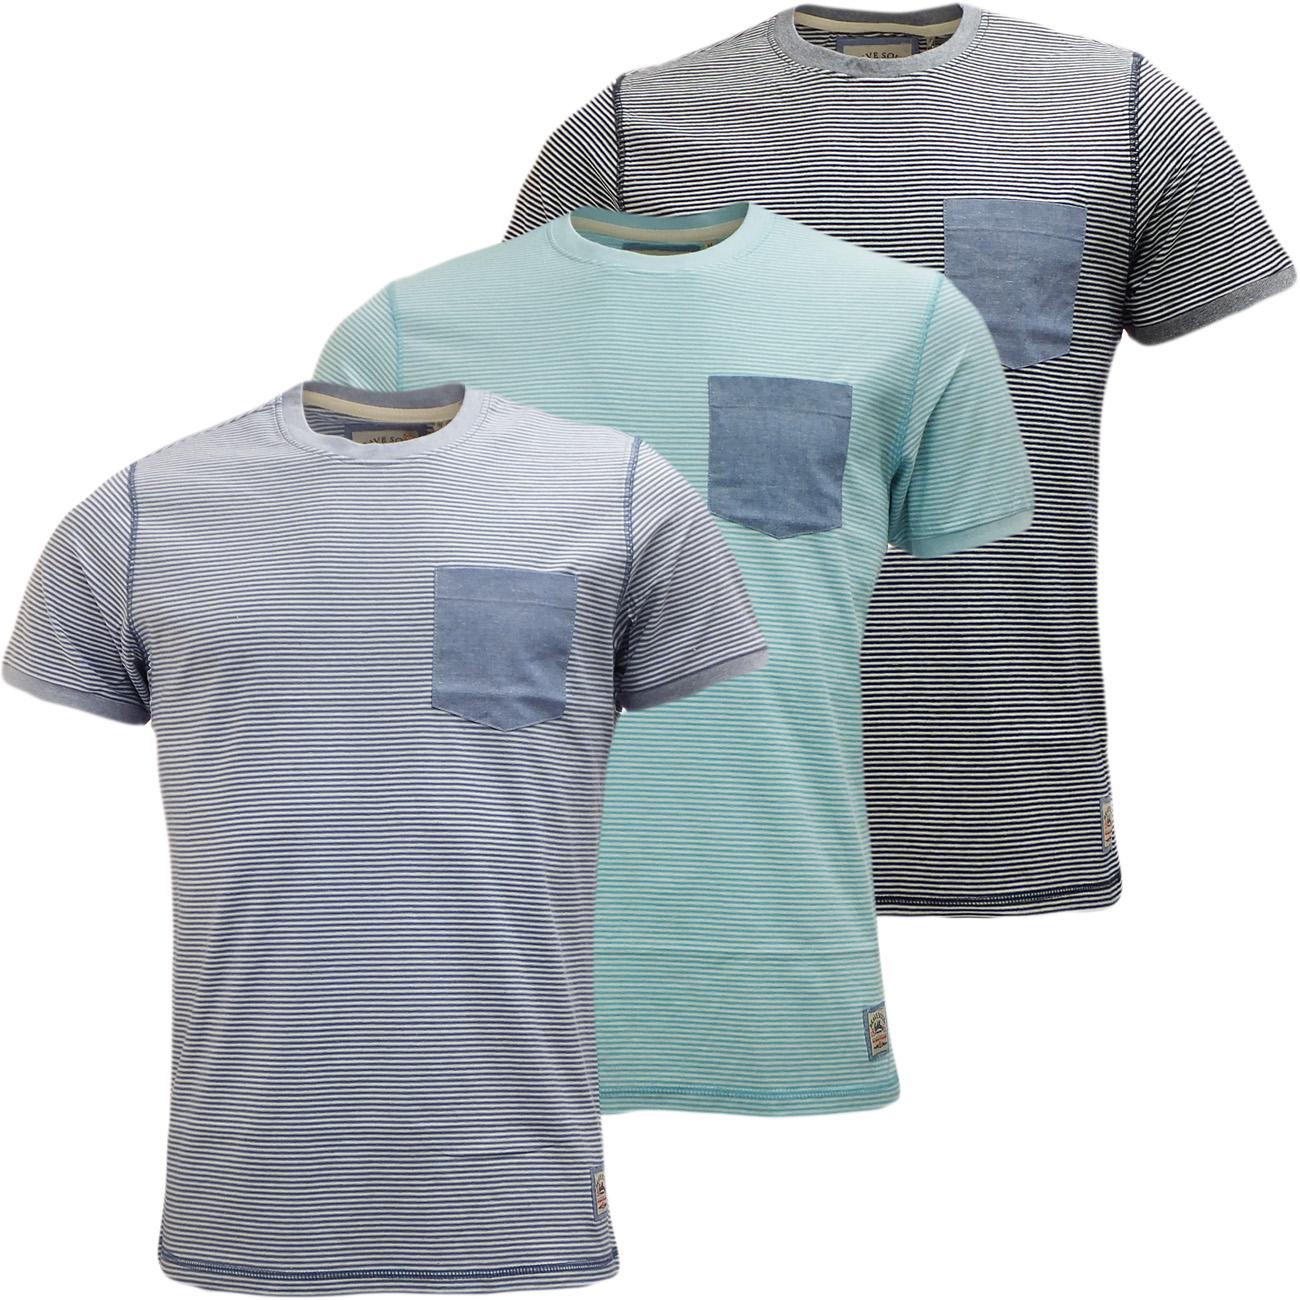 Brave Soul T-Shirts - 'Englert'